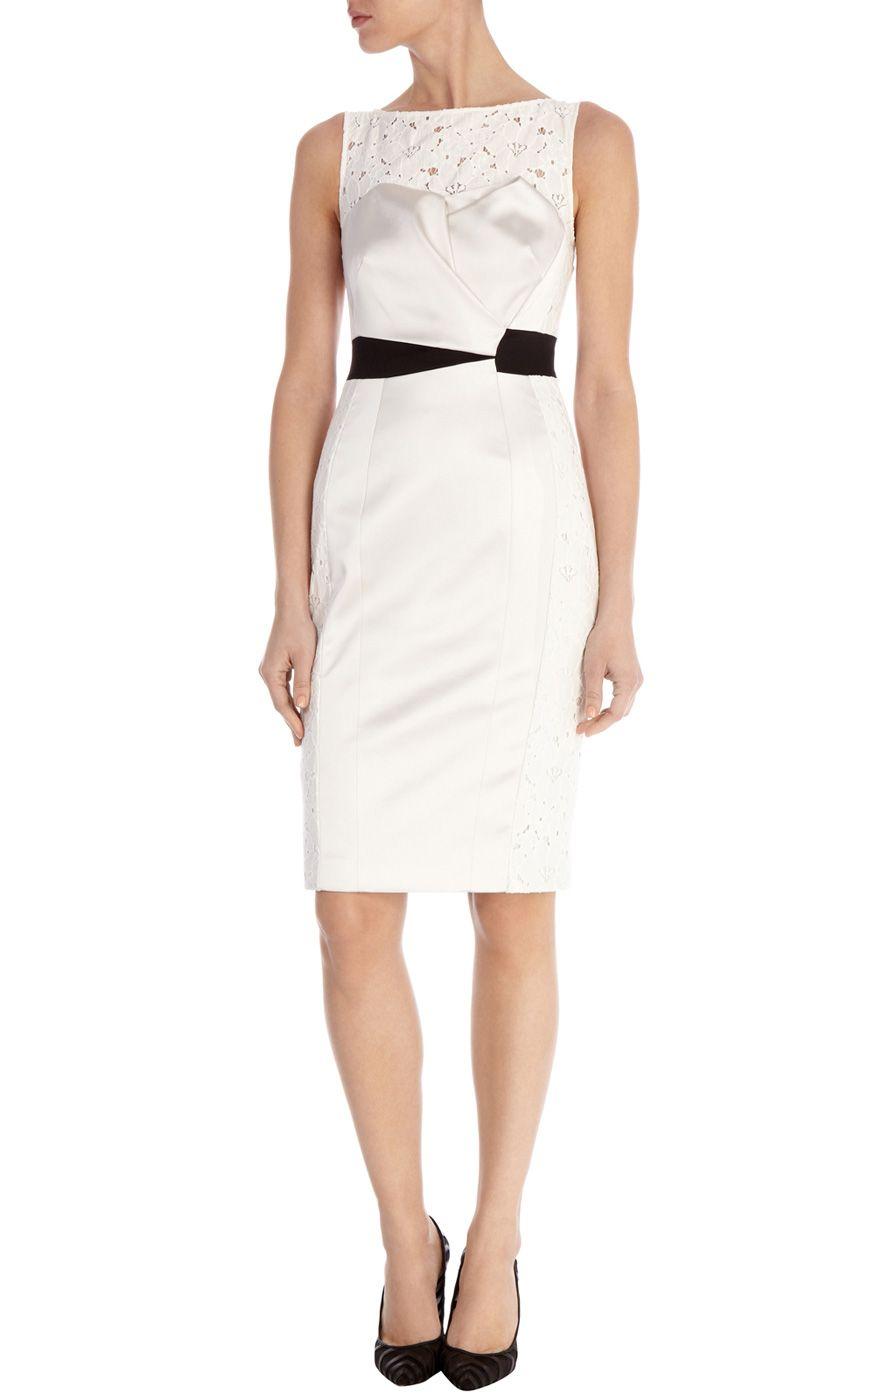 Tuxedo shift dress | Luxury Women\'s OccasionWear | Karen Millen my ...